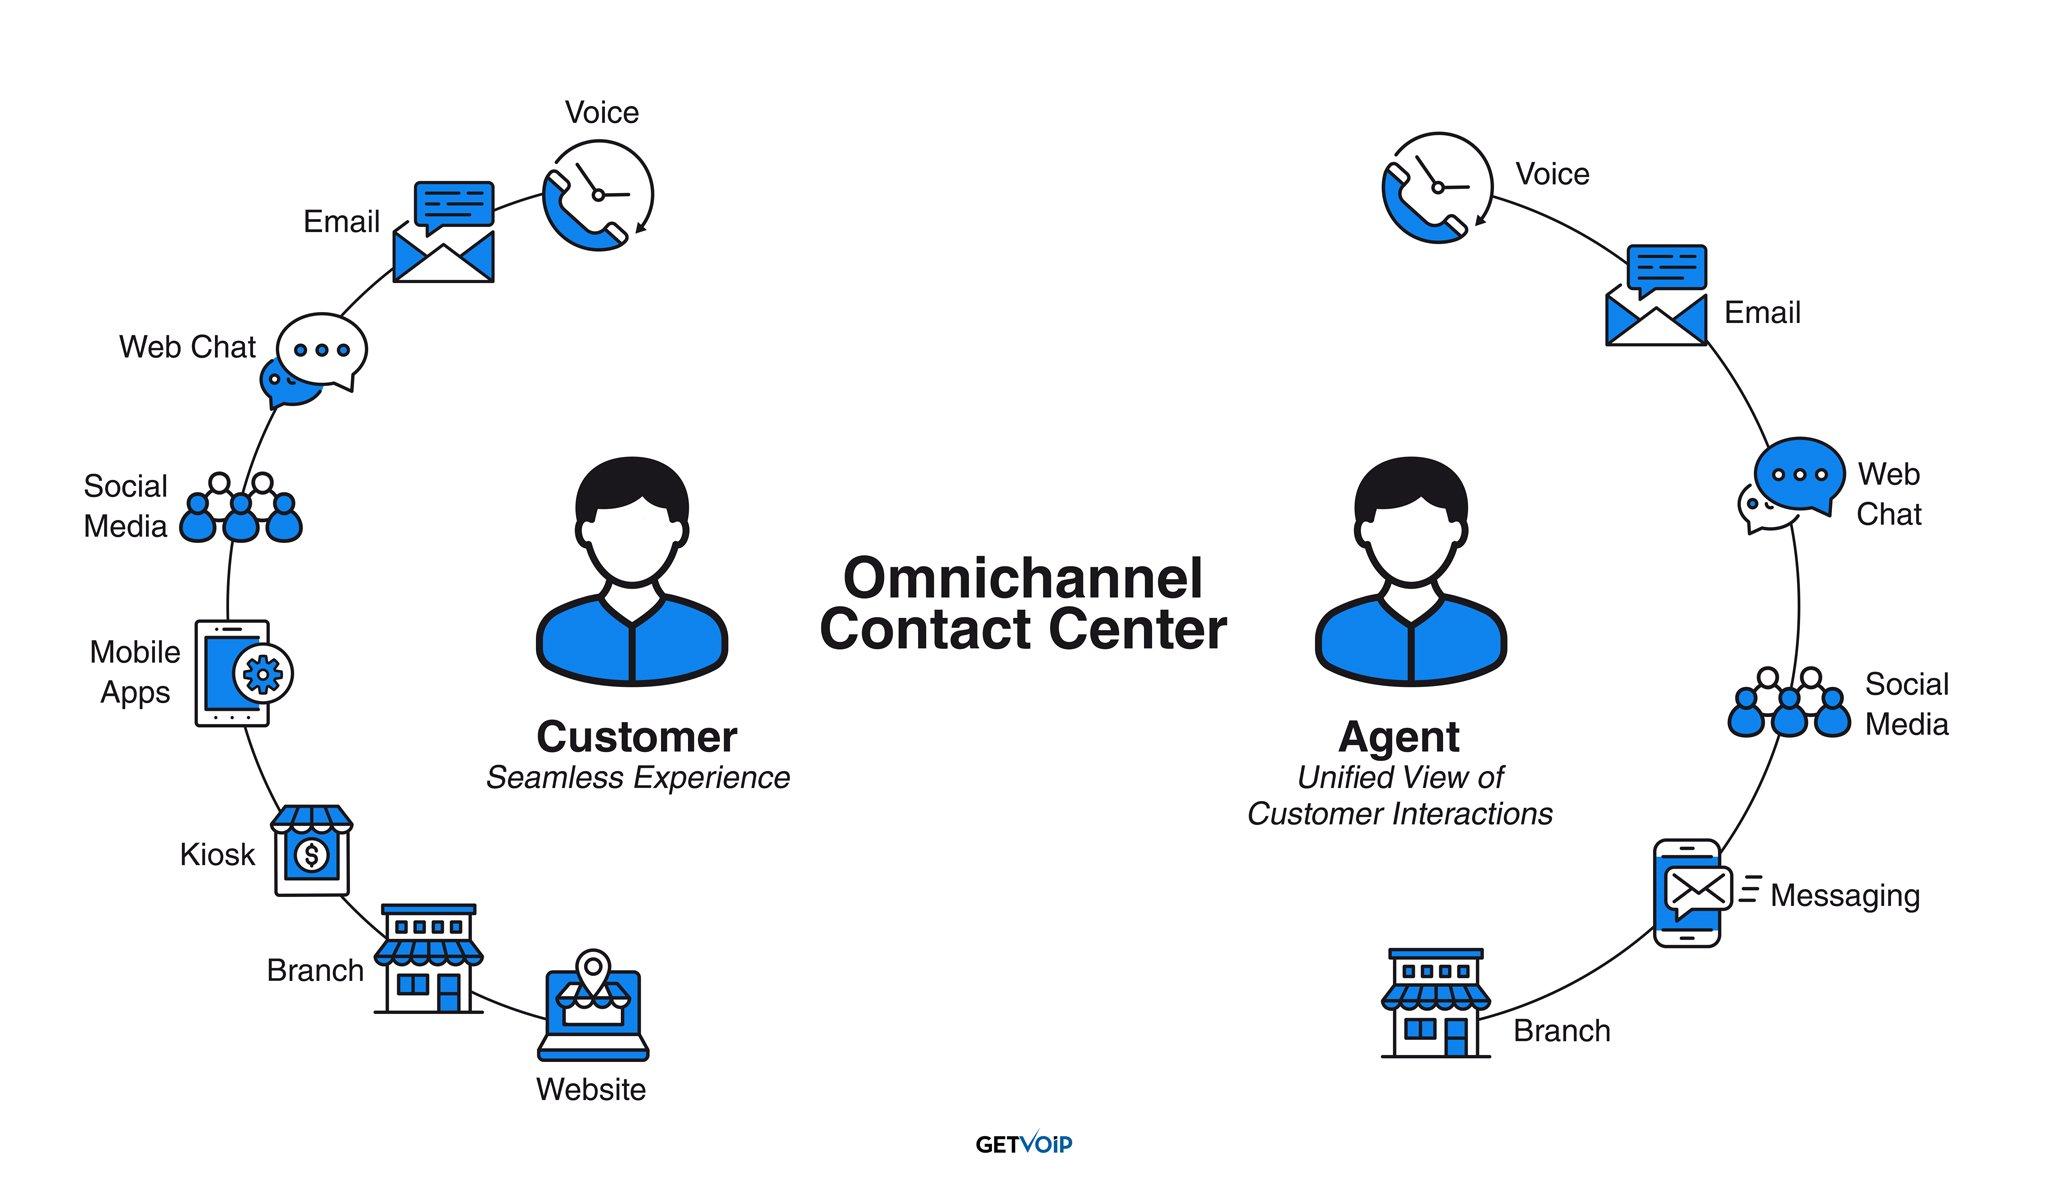 Omnichannel Contact Center